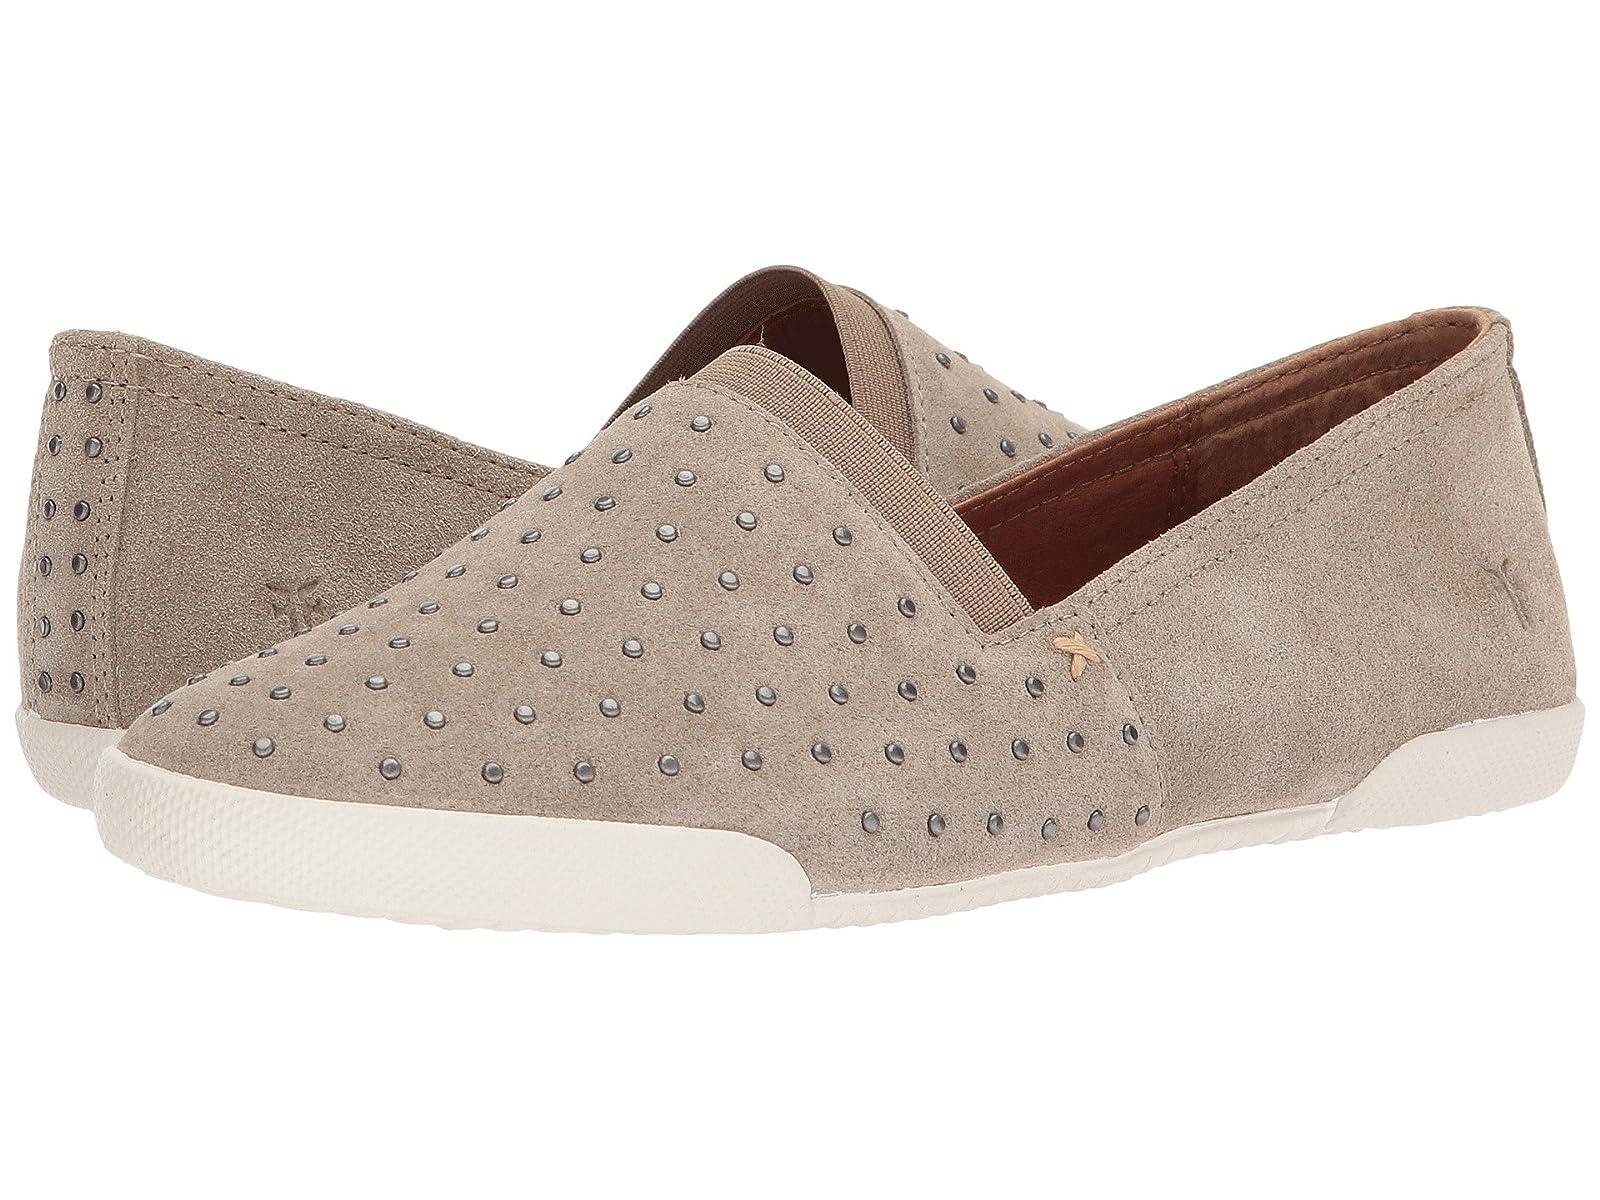 Frye Melanie Micro Stud Slip-OnAtmospheric grades have affordable shoes